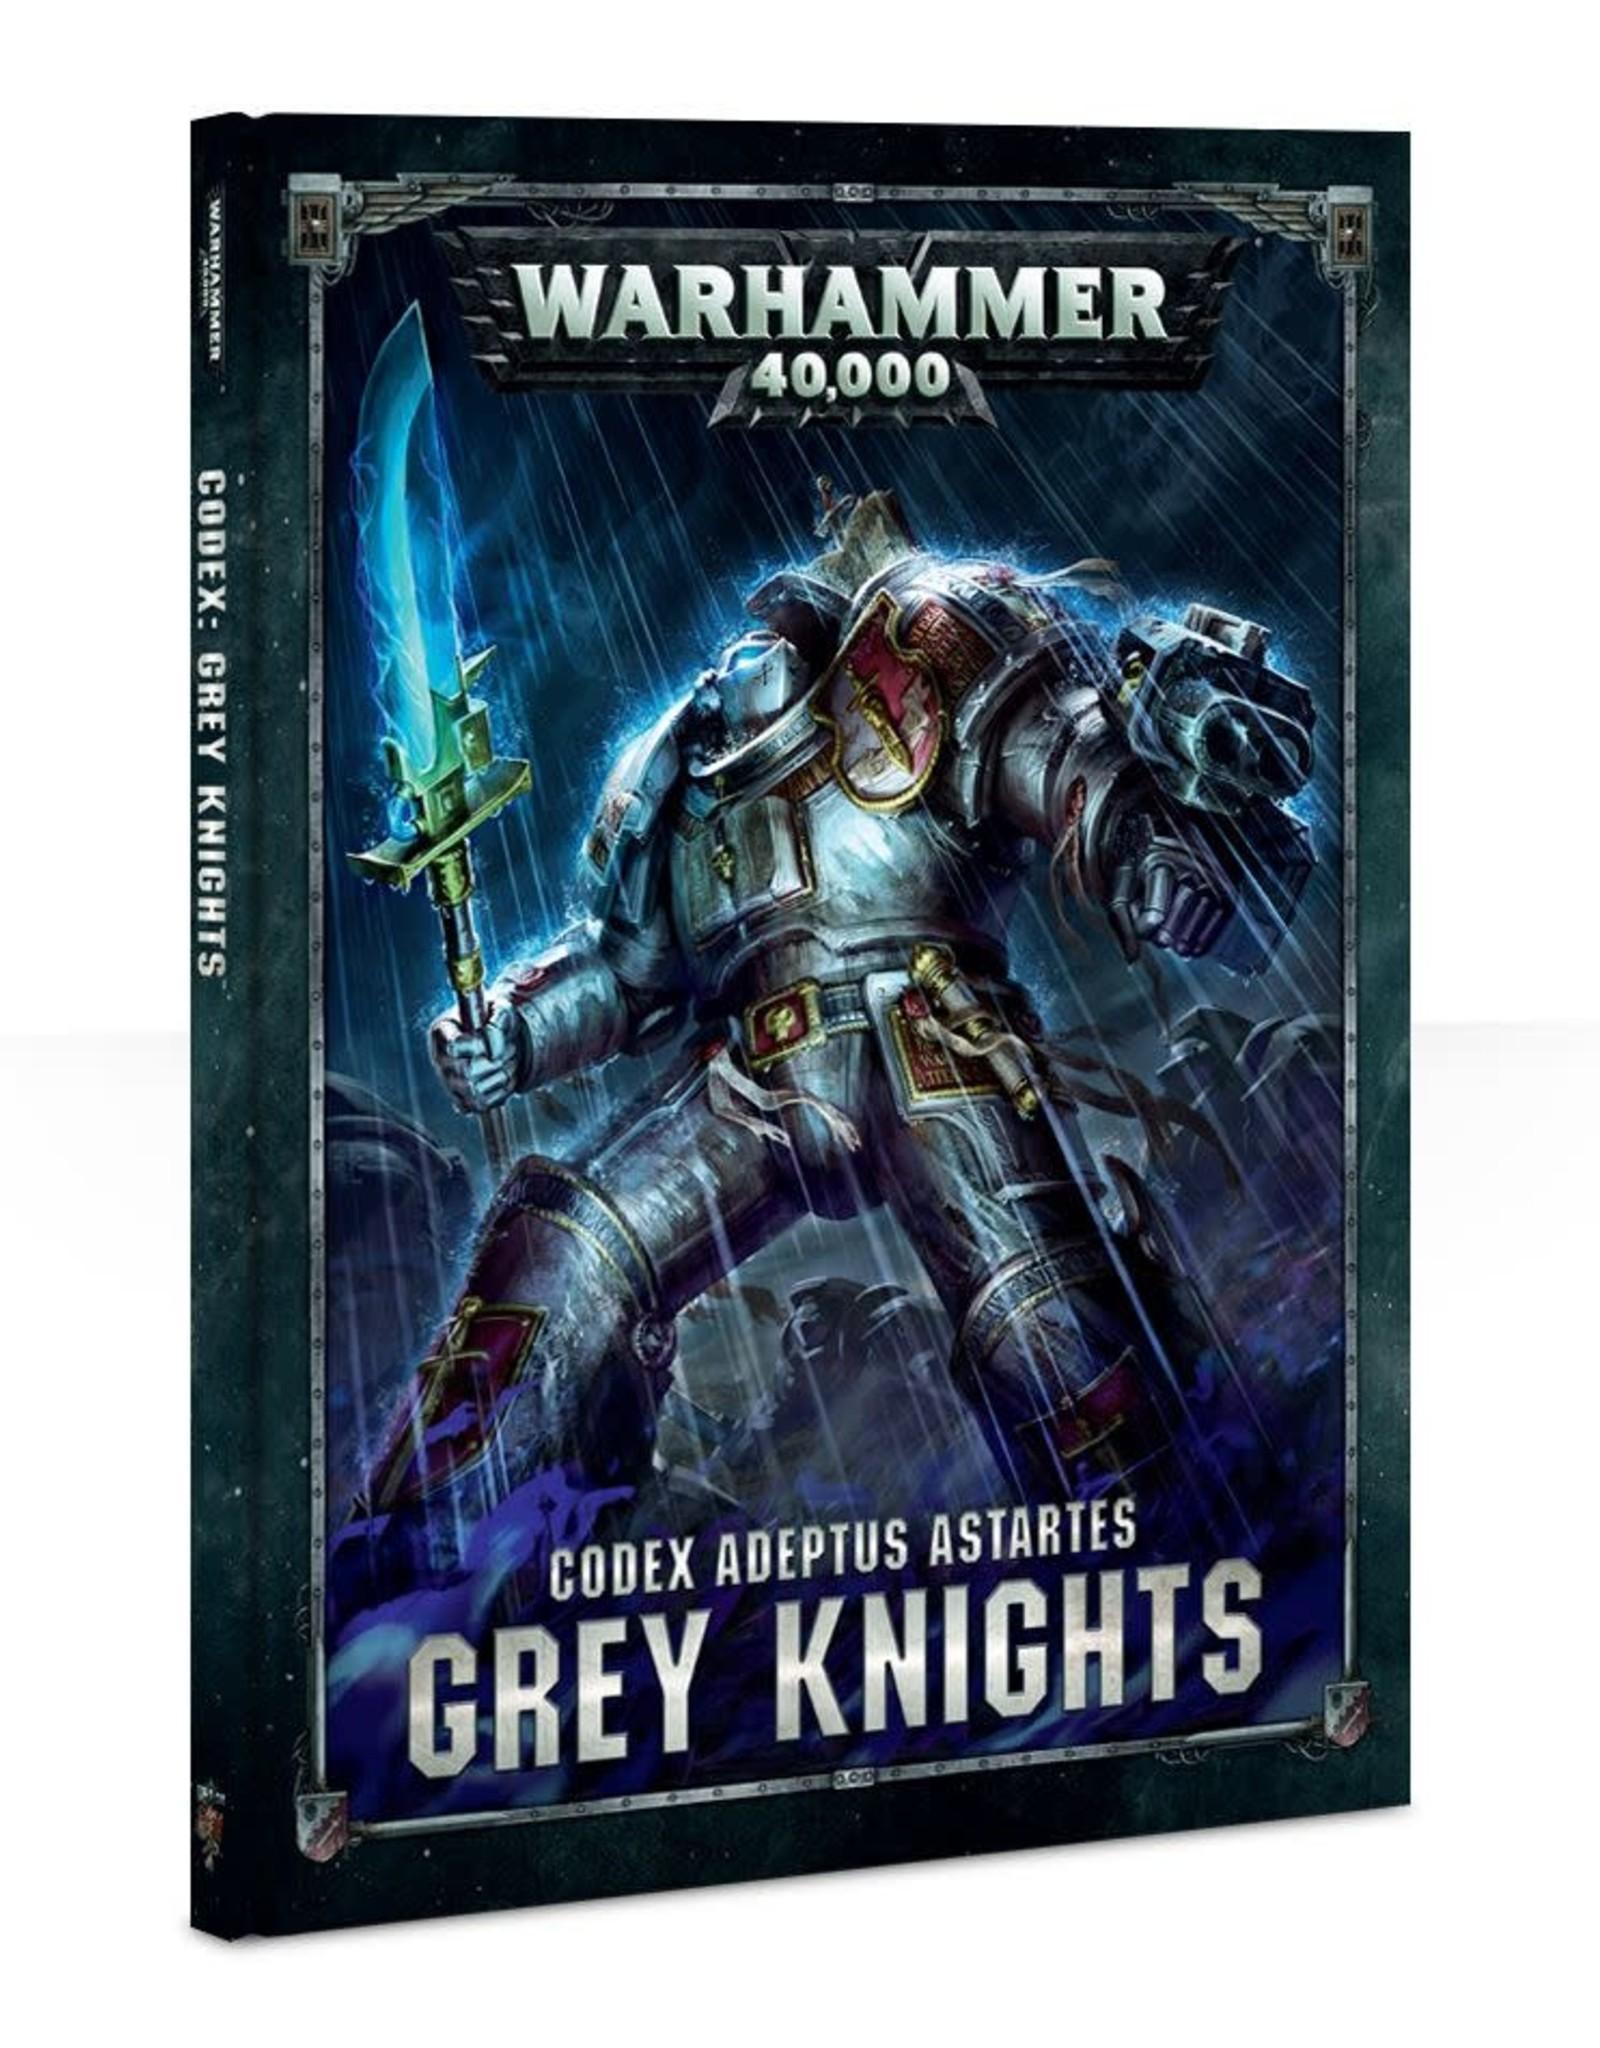 Warhammer 40K Codex: Grey Knights